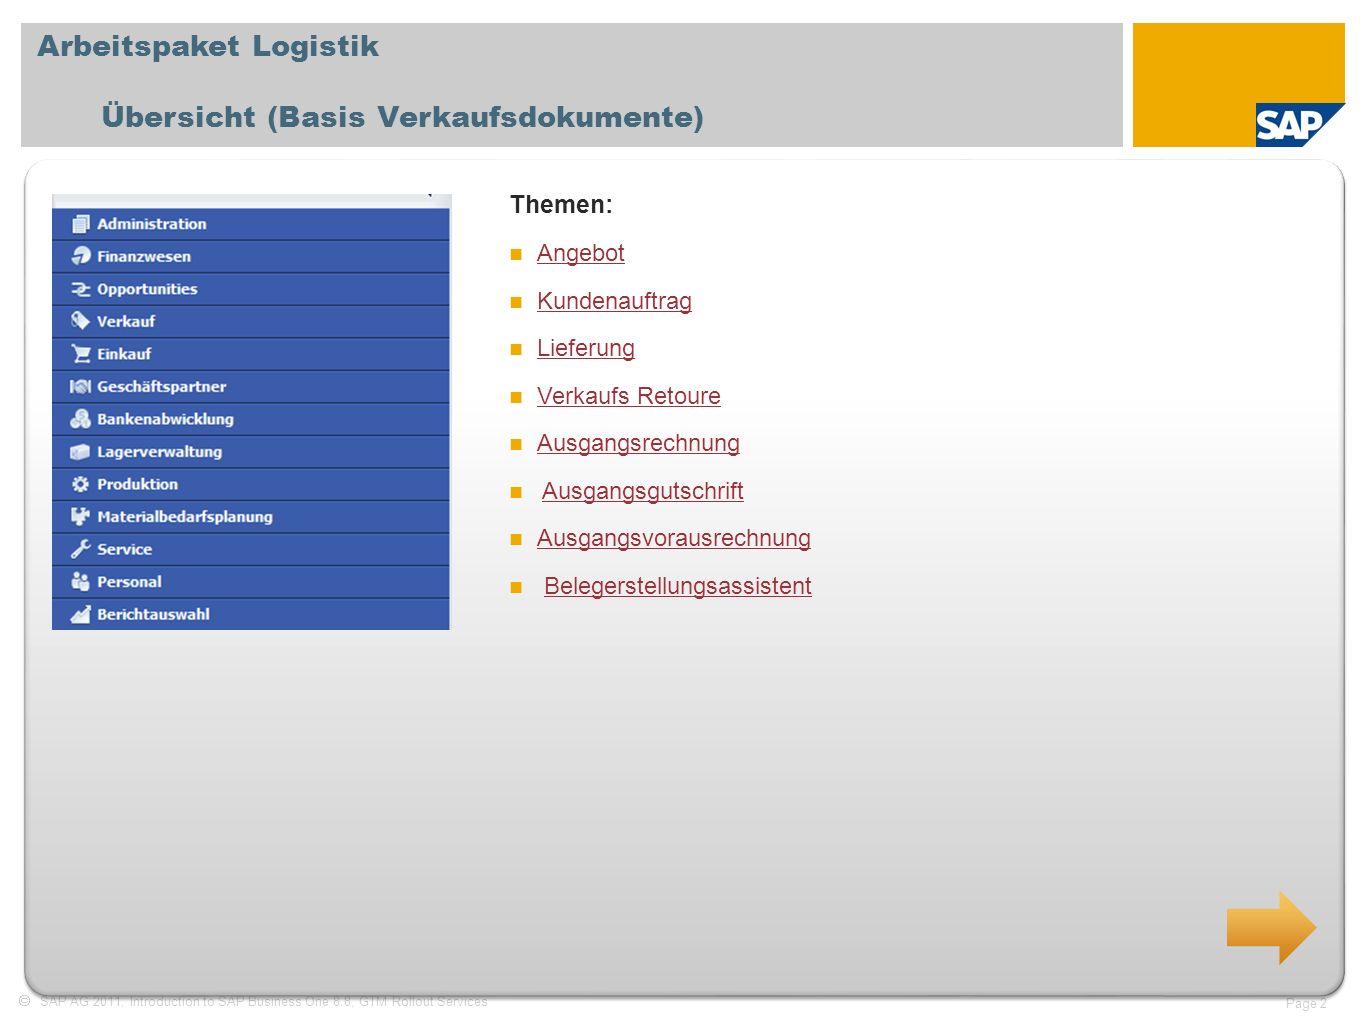 Arbeitspaket Logistik Übersicht (Basis Verkaufsdokumente)